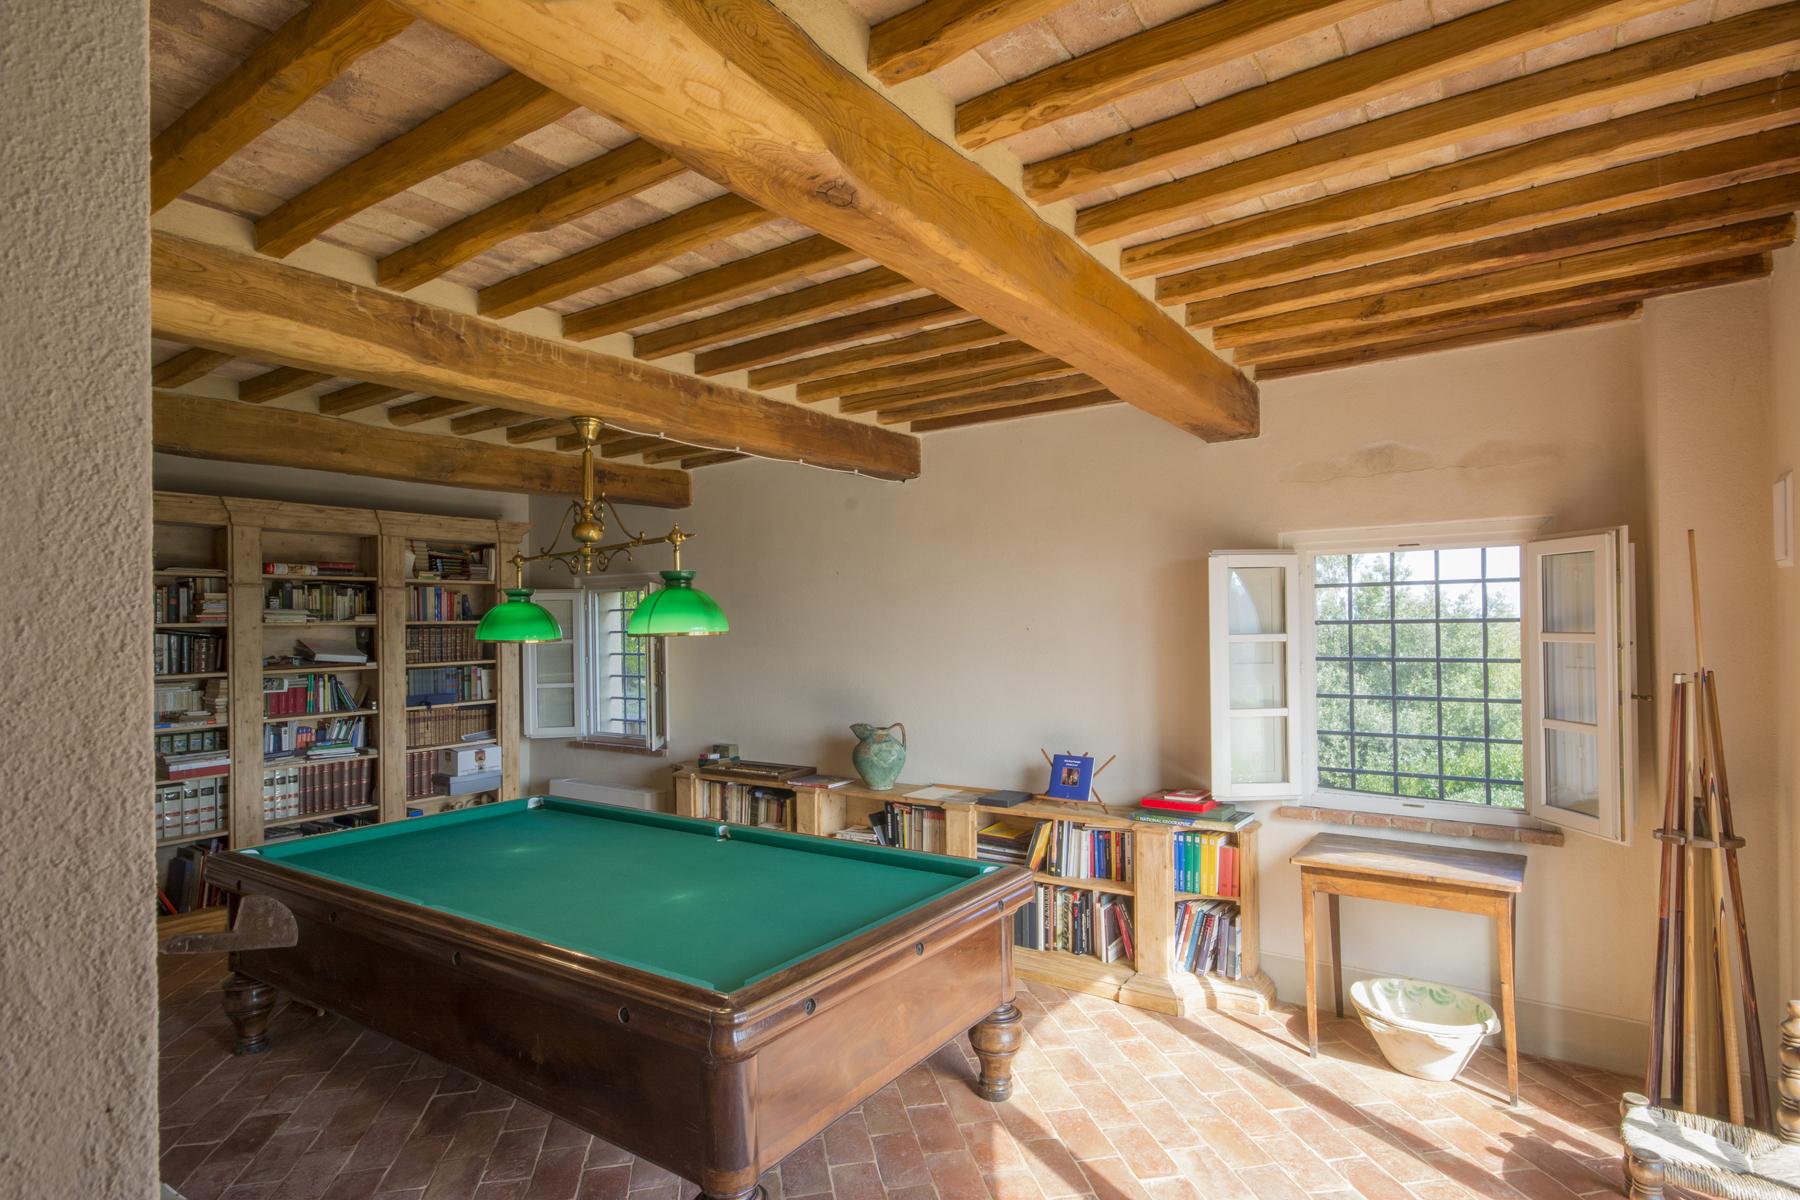 Additional photo for property listing at Magnificent villa in the Tuscan countryside Via di Valdisonzi Crespina, Pisa 56040 Italia